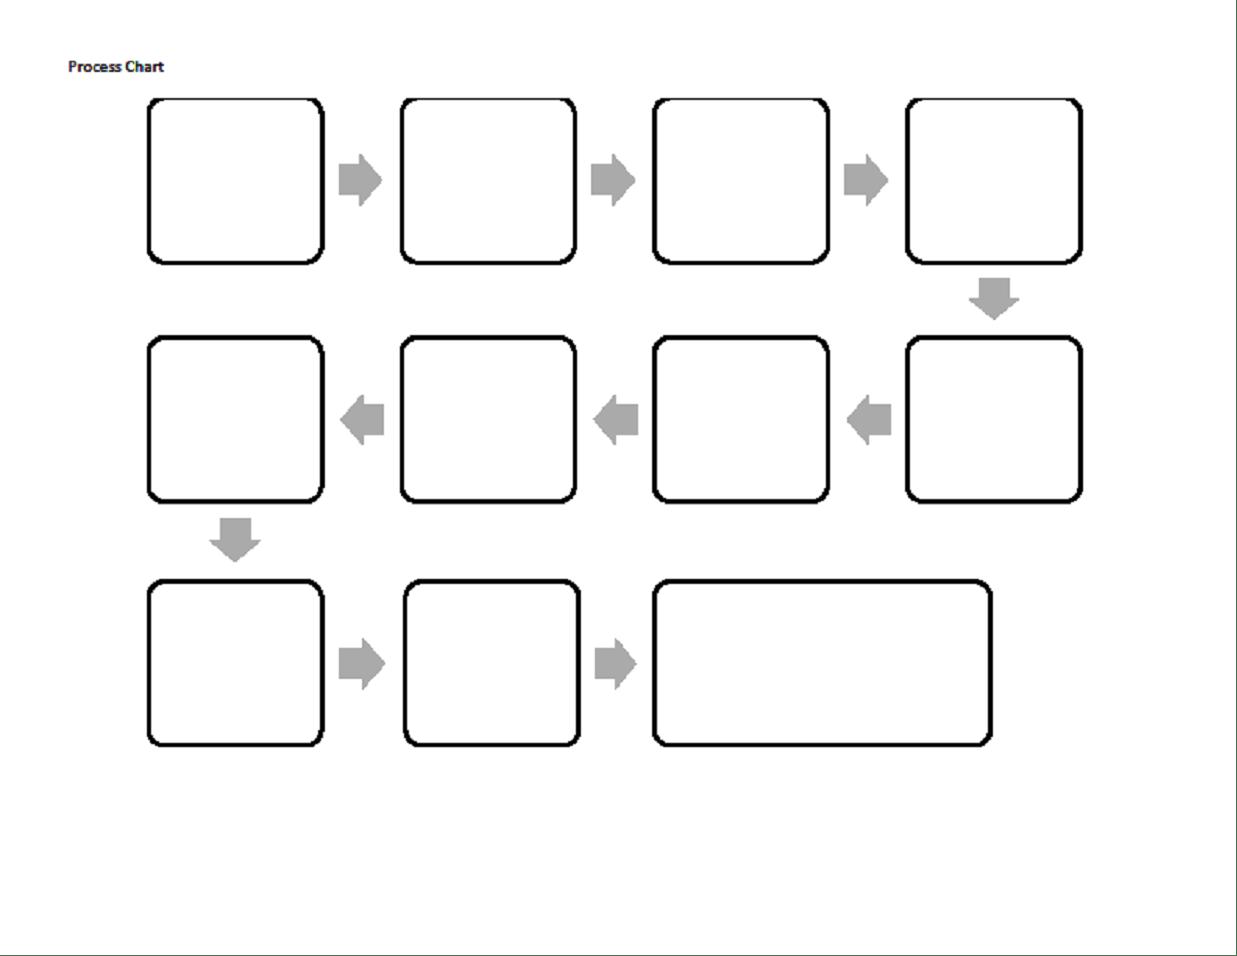 blank tree diagram graphic organizer problem solving involving sets using venn diagrams process chart 150 allfreecharts